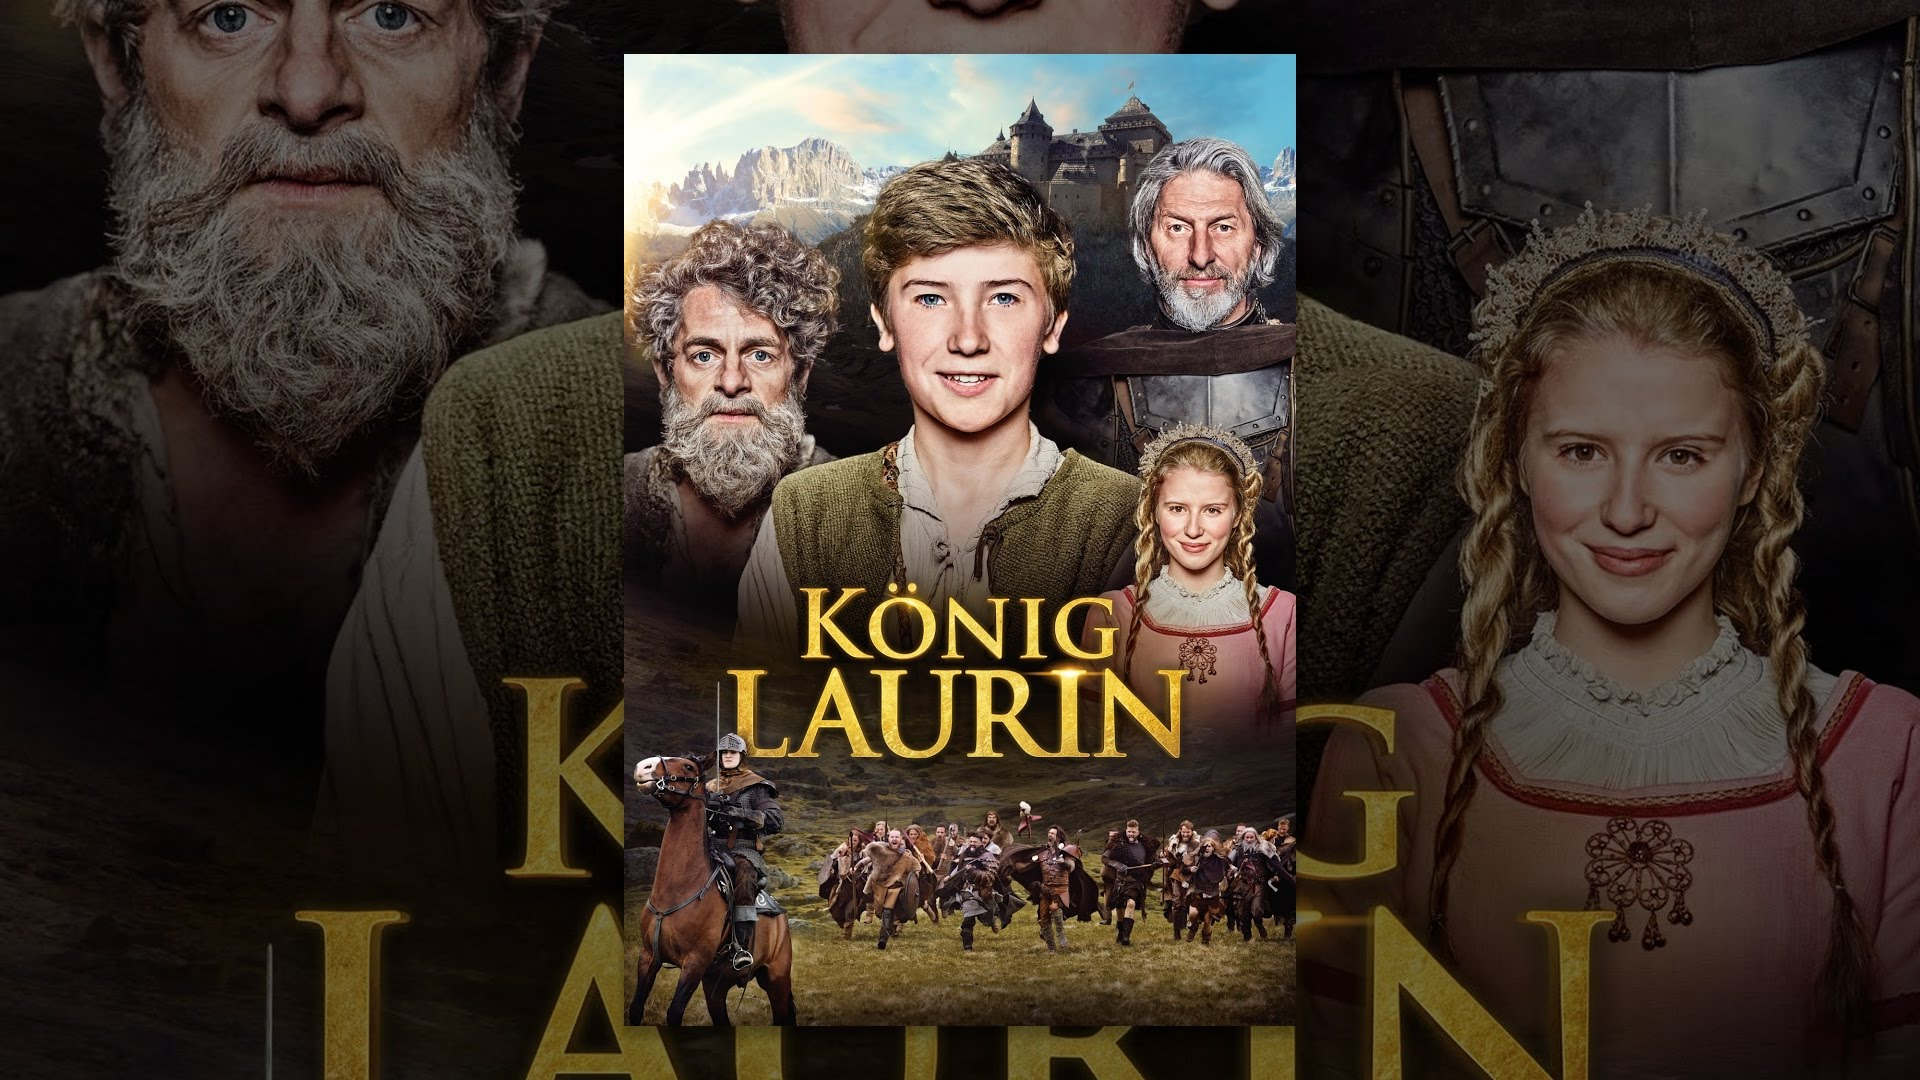 König Laurin Film